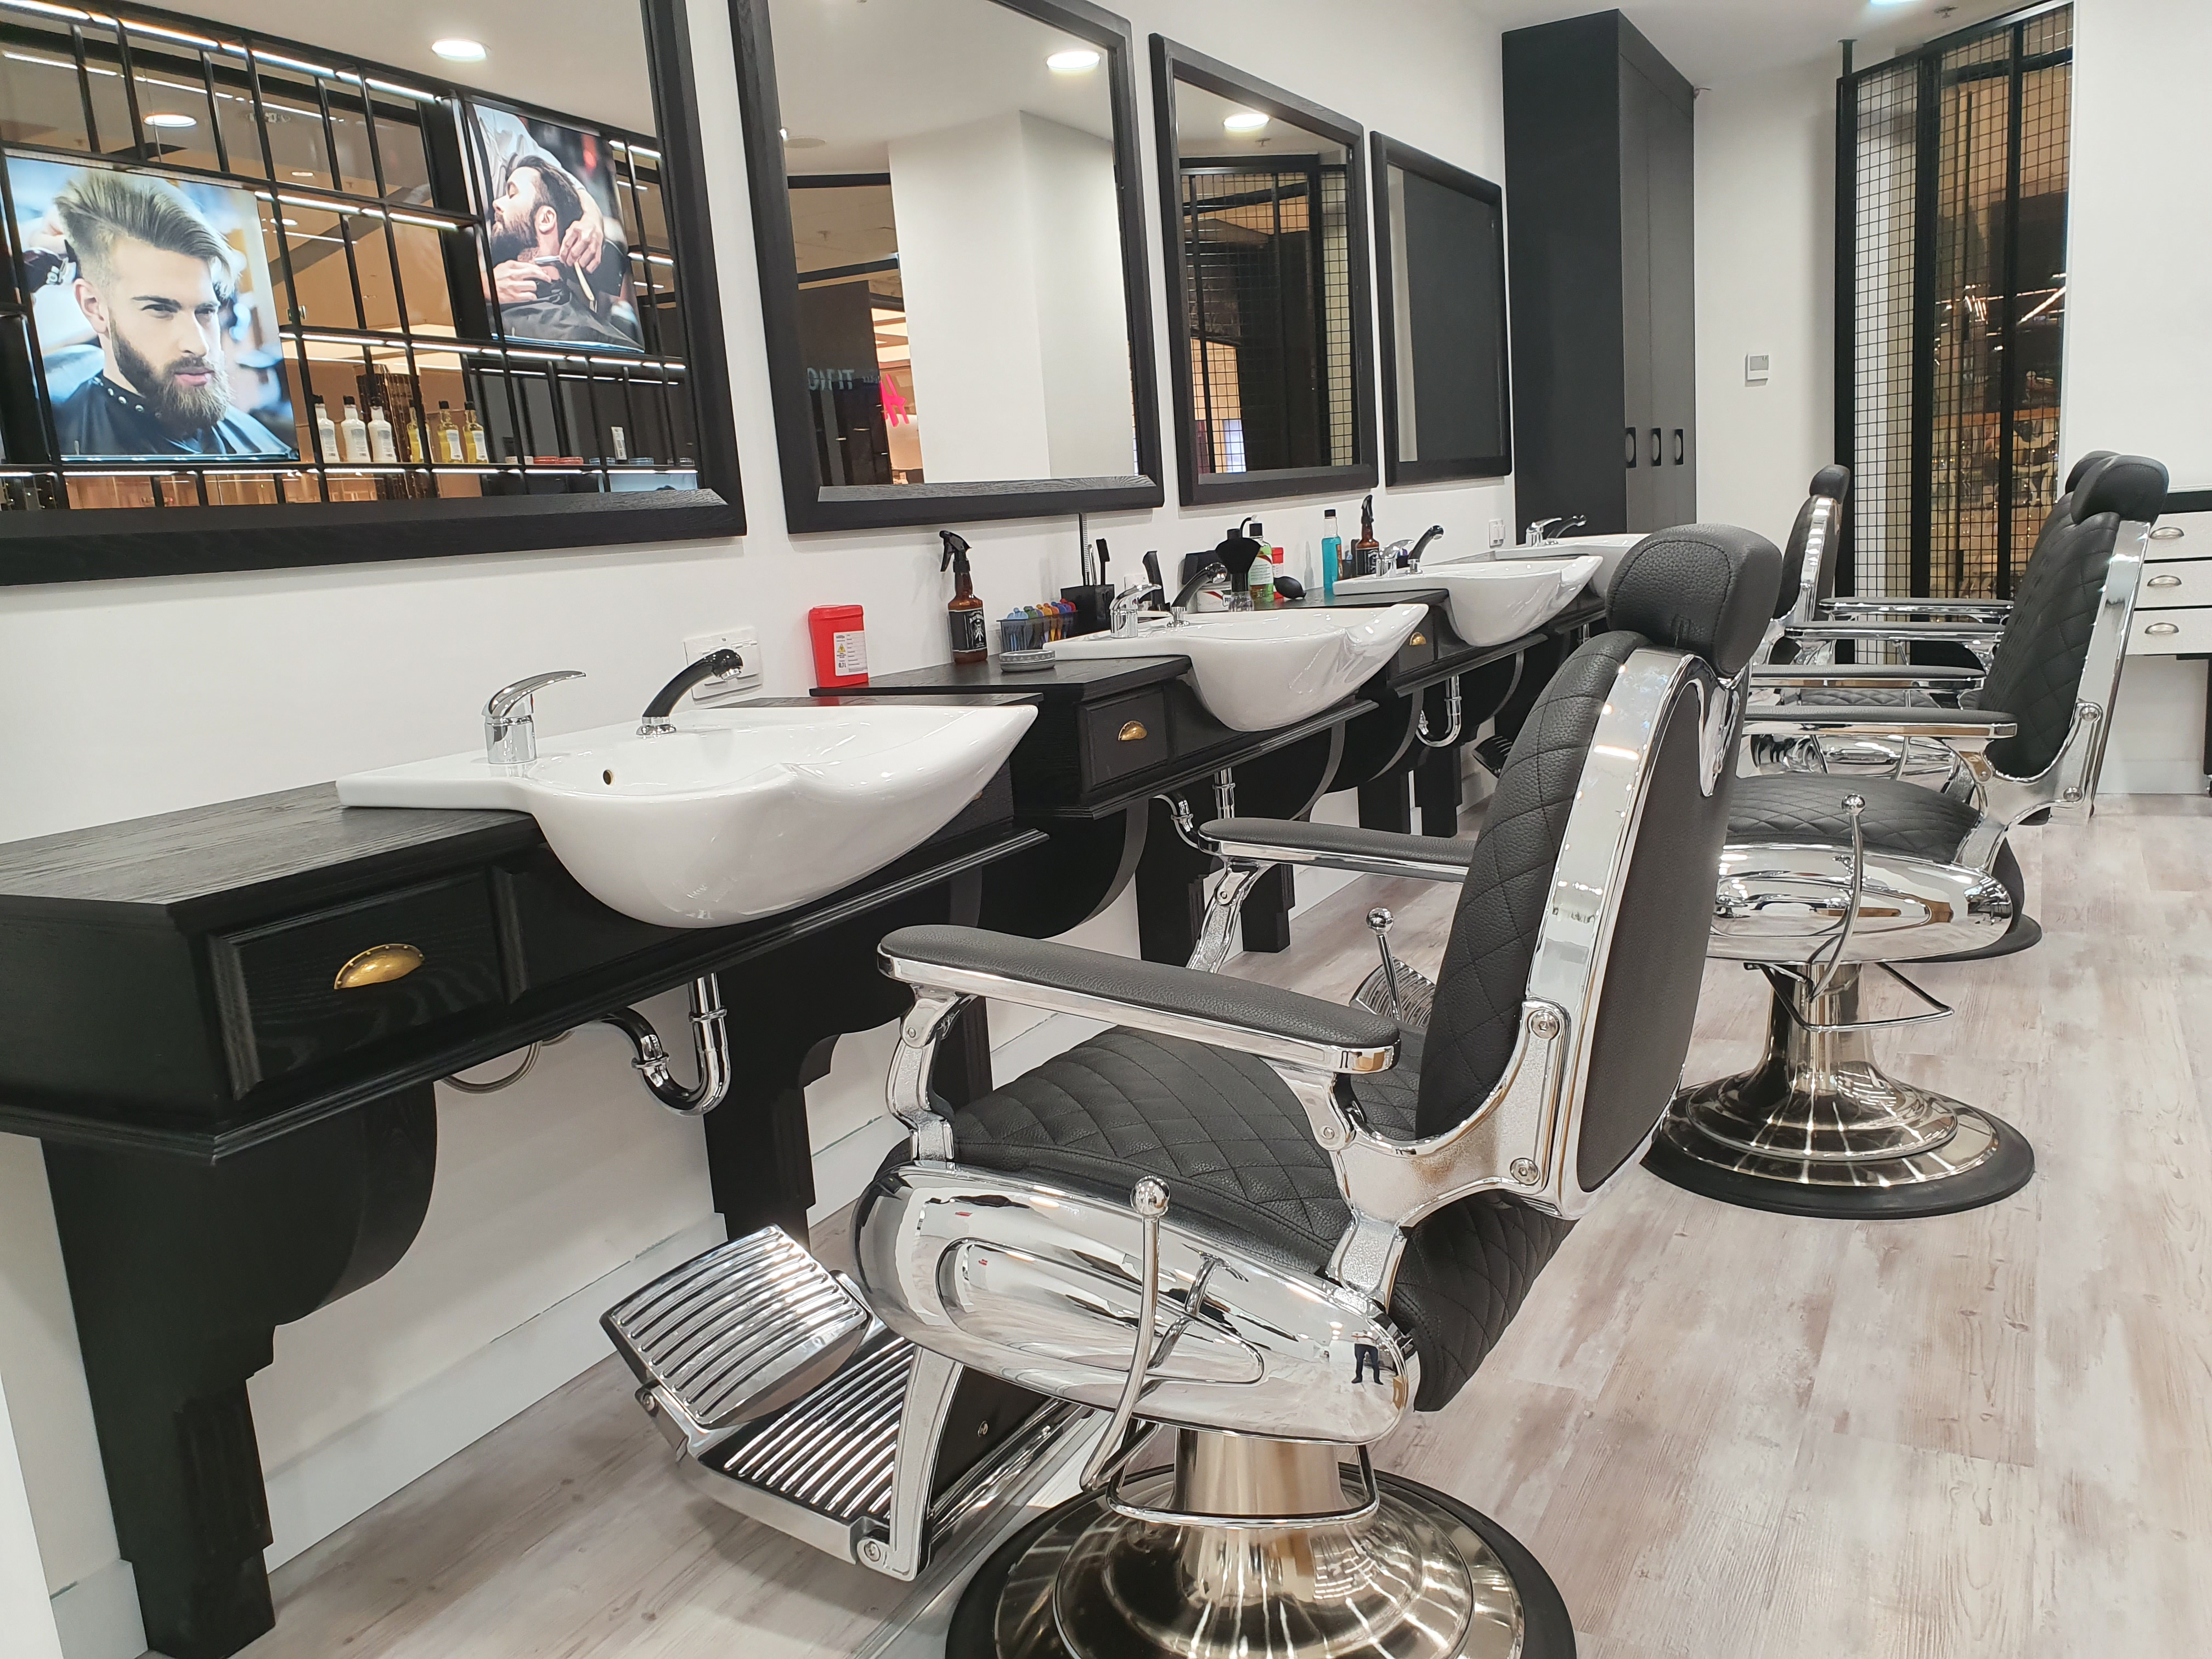 Barber_03